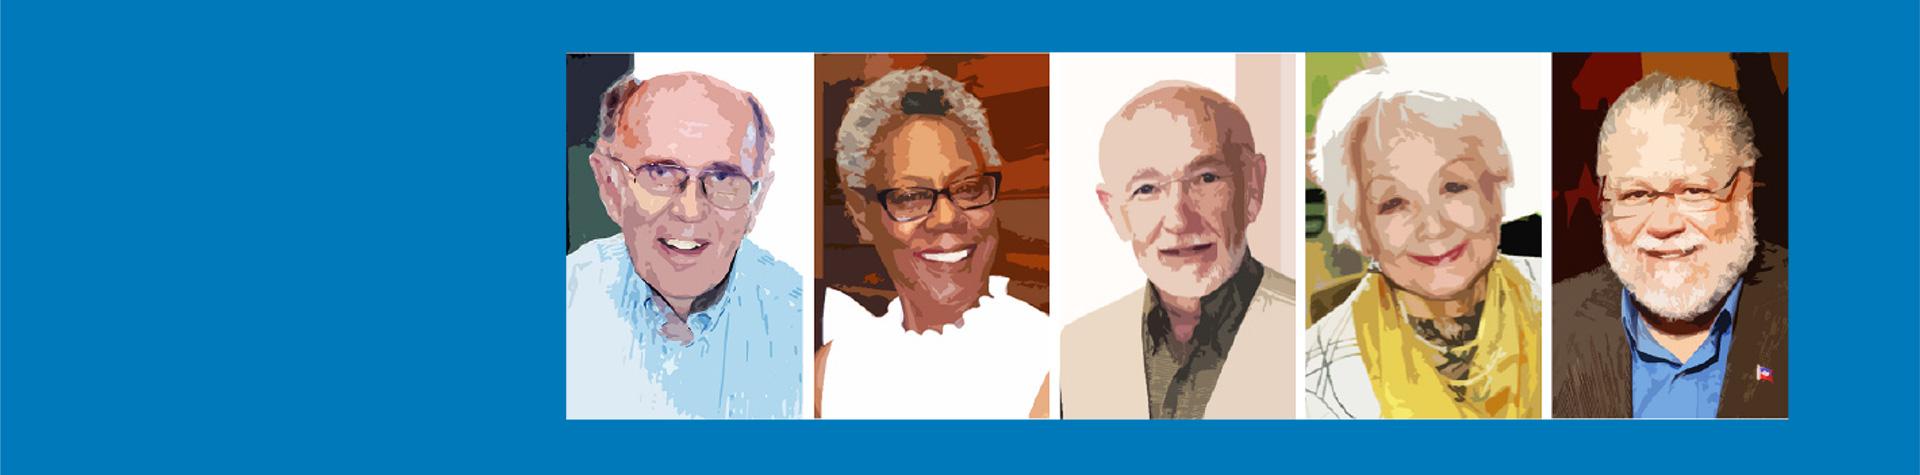 Saint John's Institute On Aging